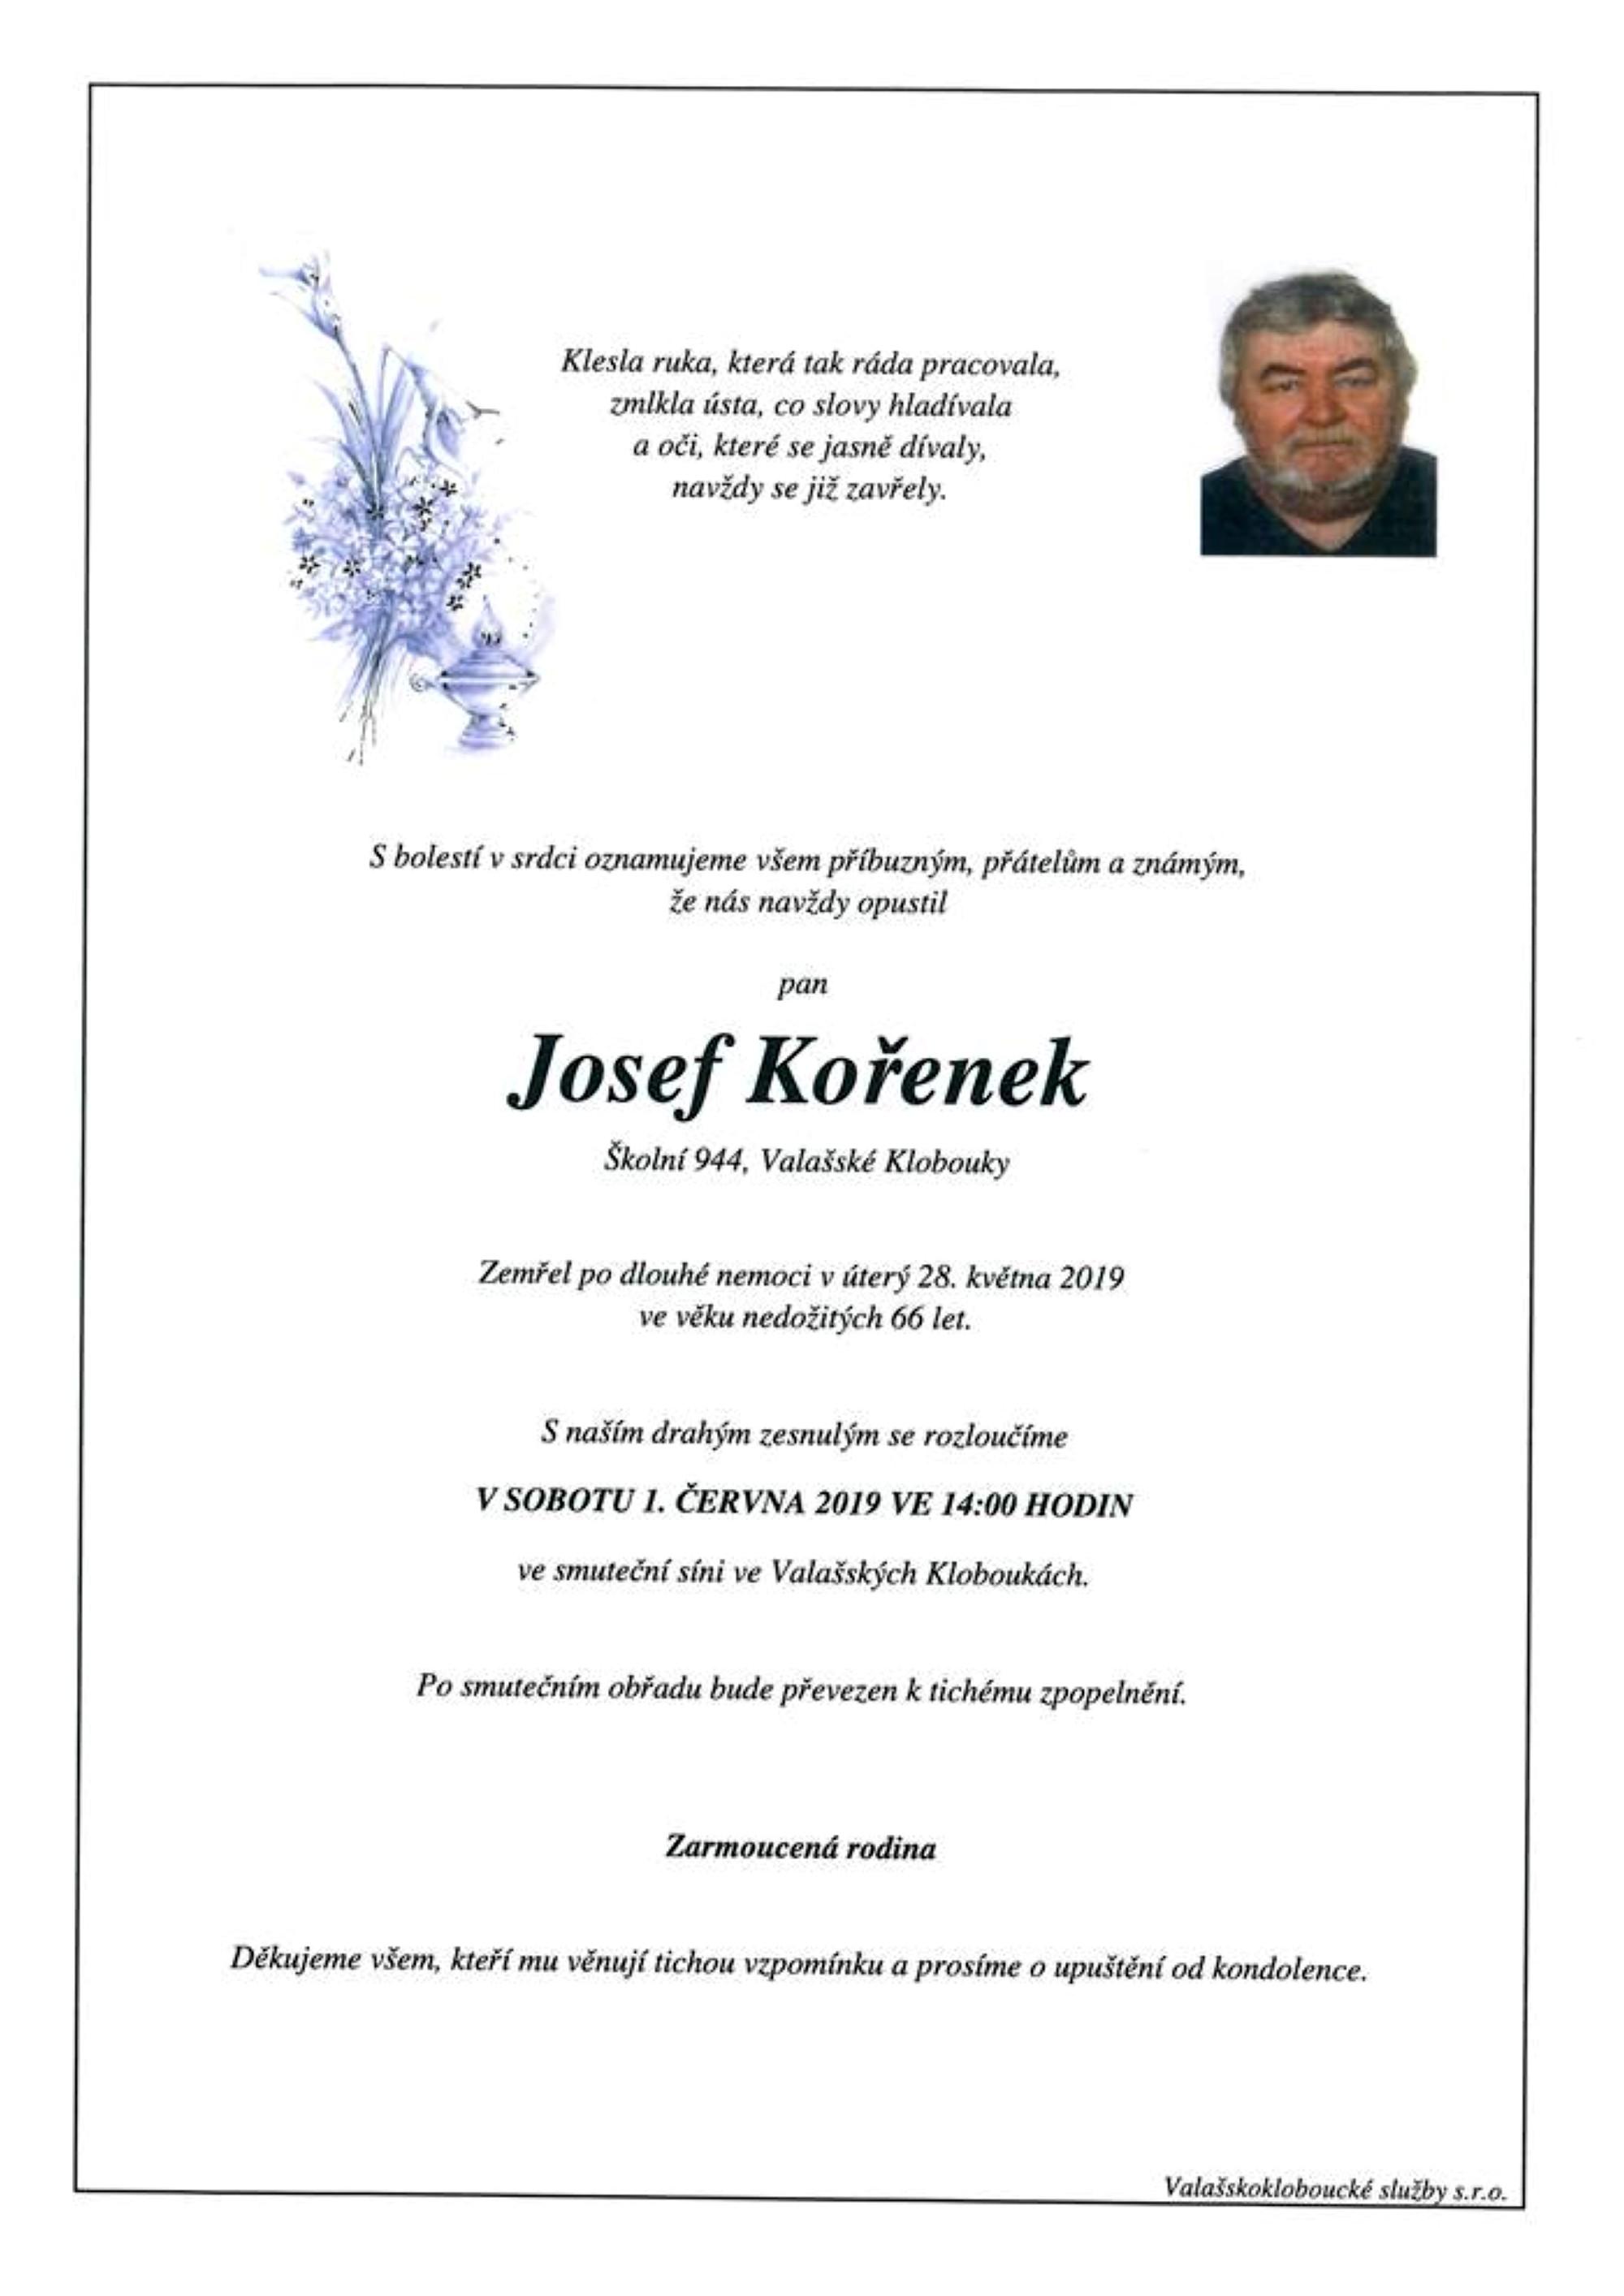 Josef Kořenek